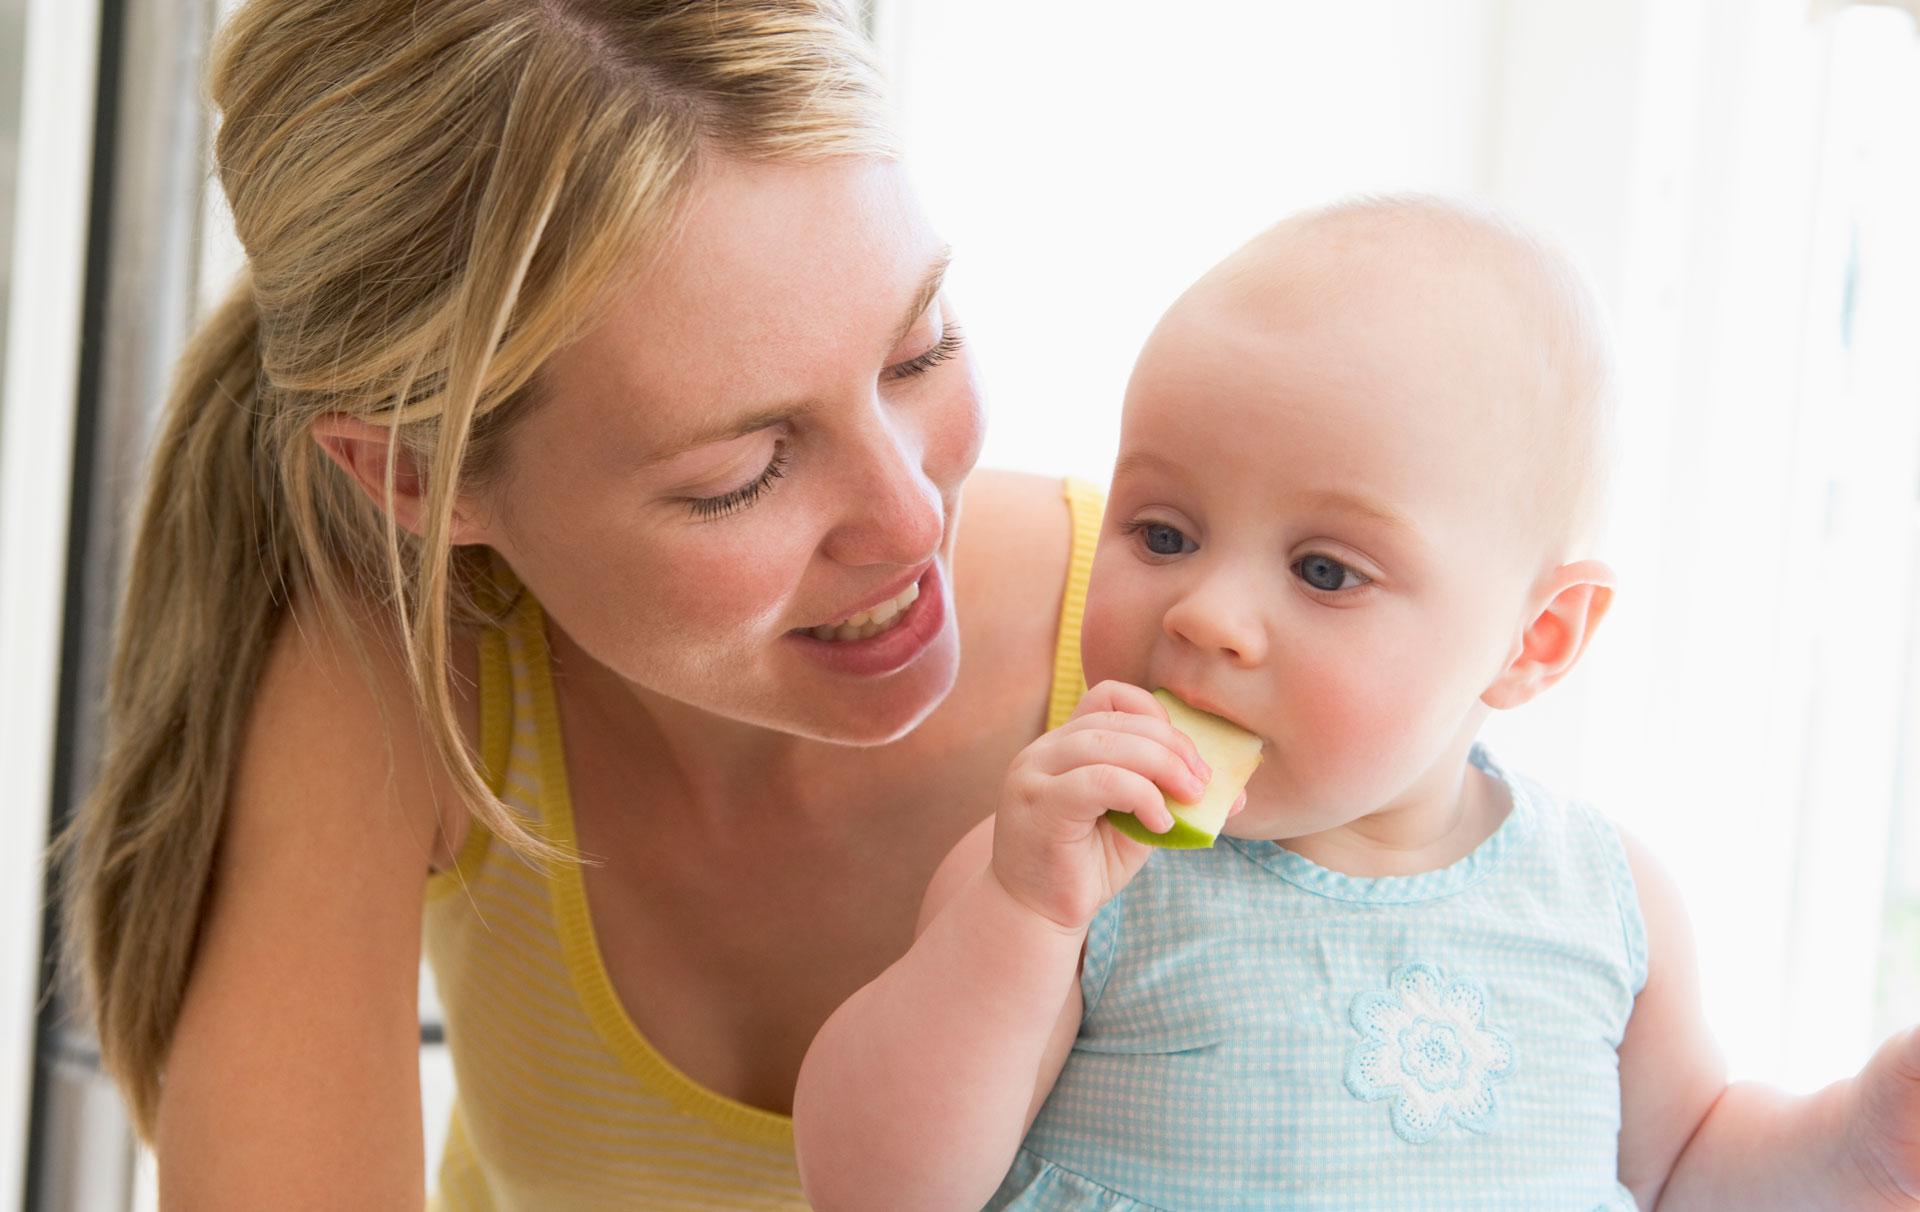 Baby-led weaning (BLW)